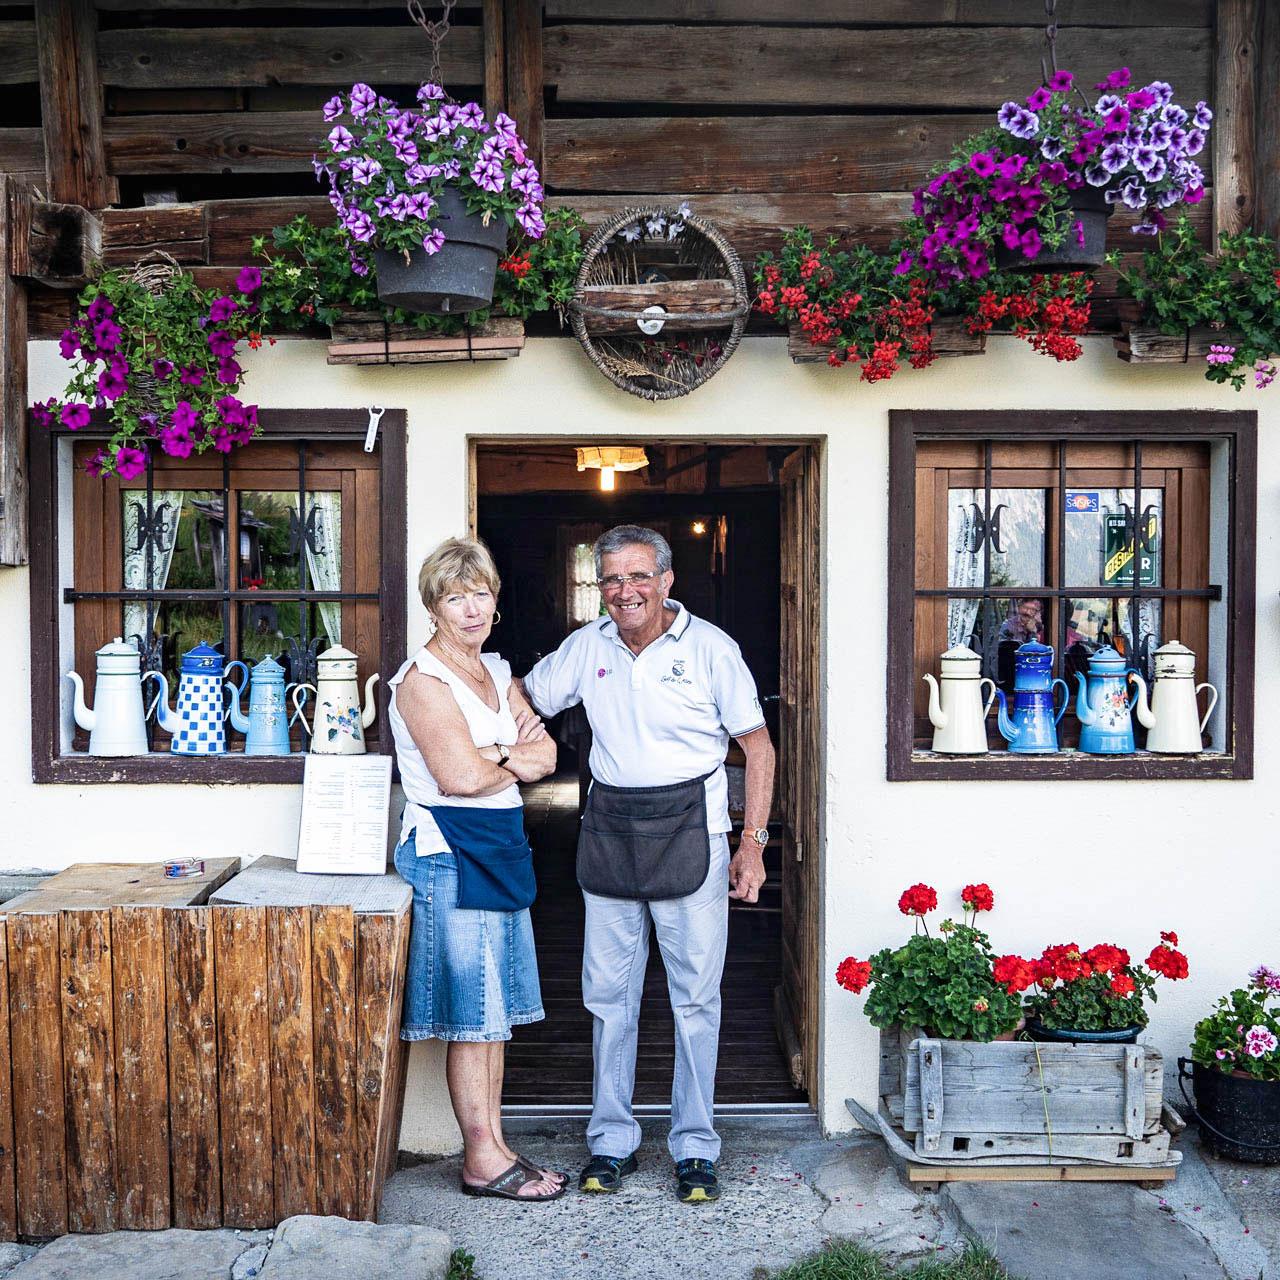 les-frasses-jacquiers-1-esprits-outdoor-le-grand-bornand-1-224140-224680